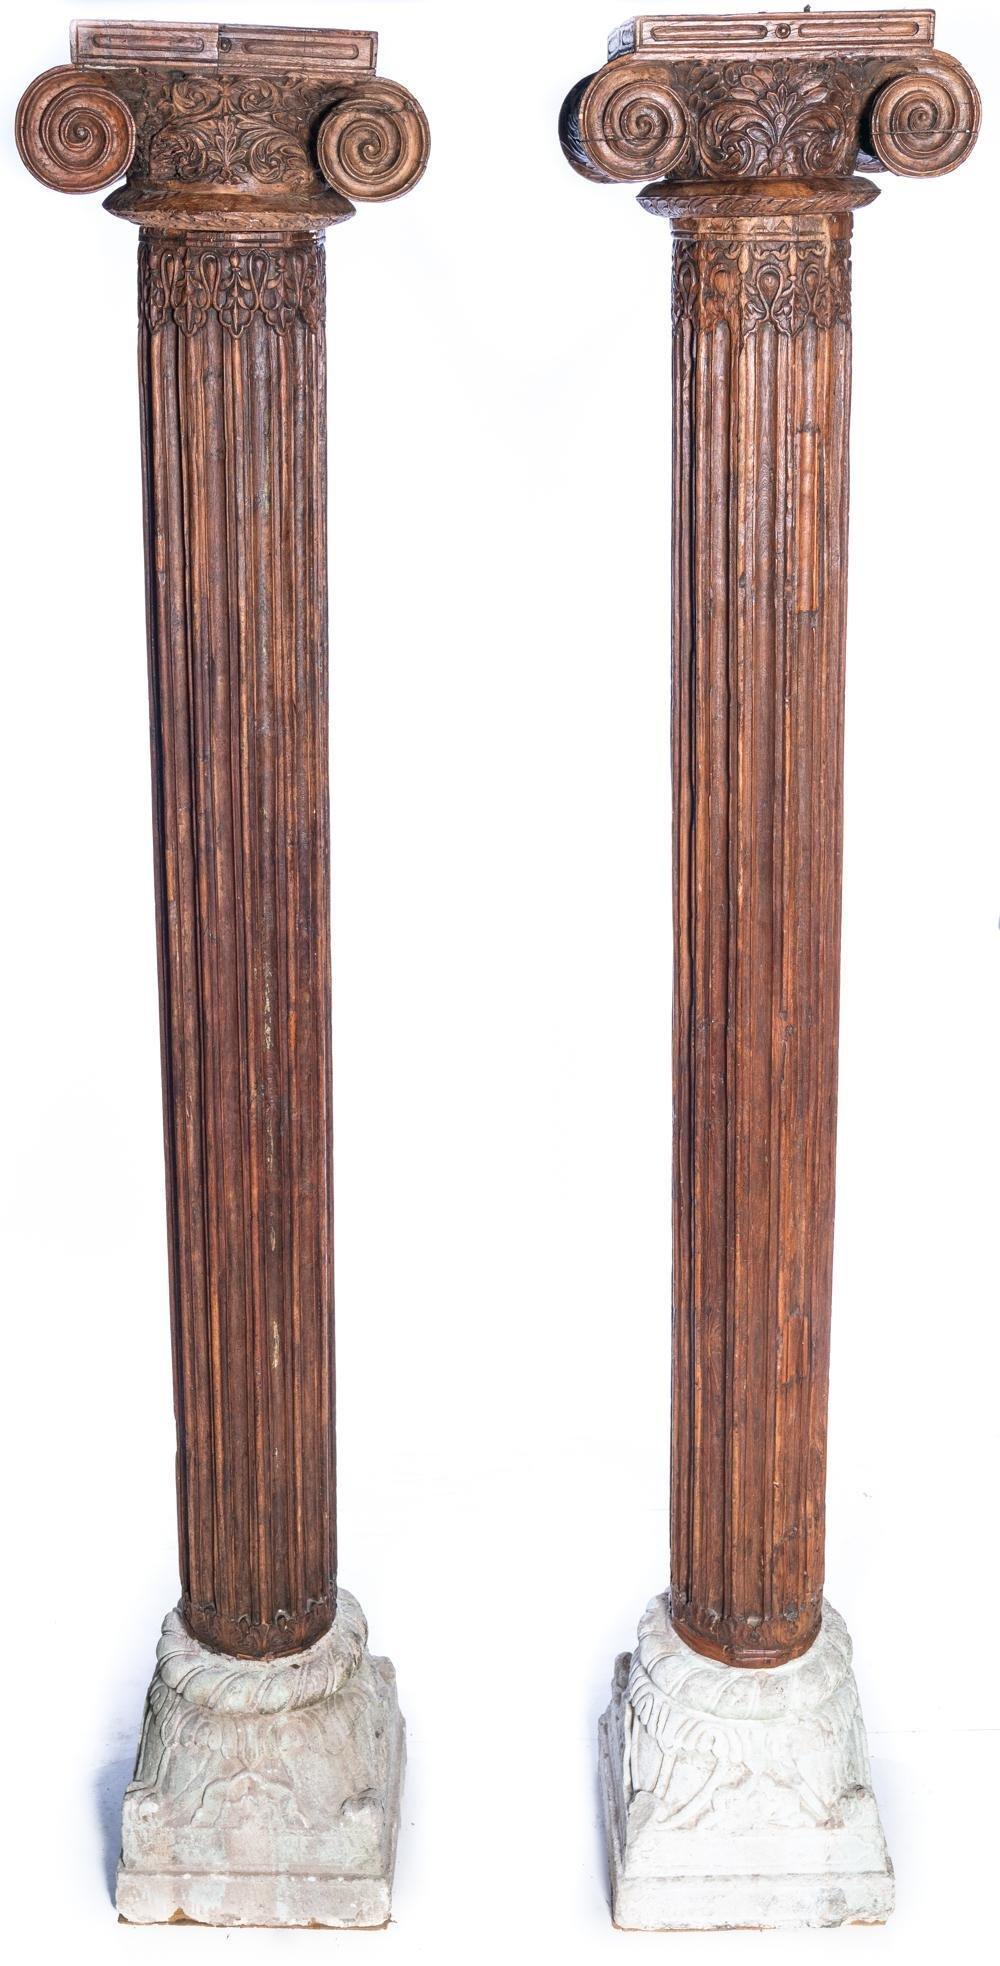 Antique Wood and Stone Corinthian Columns